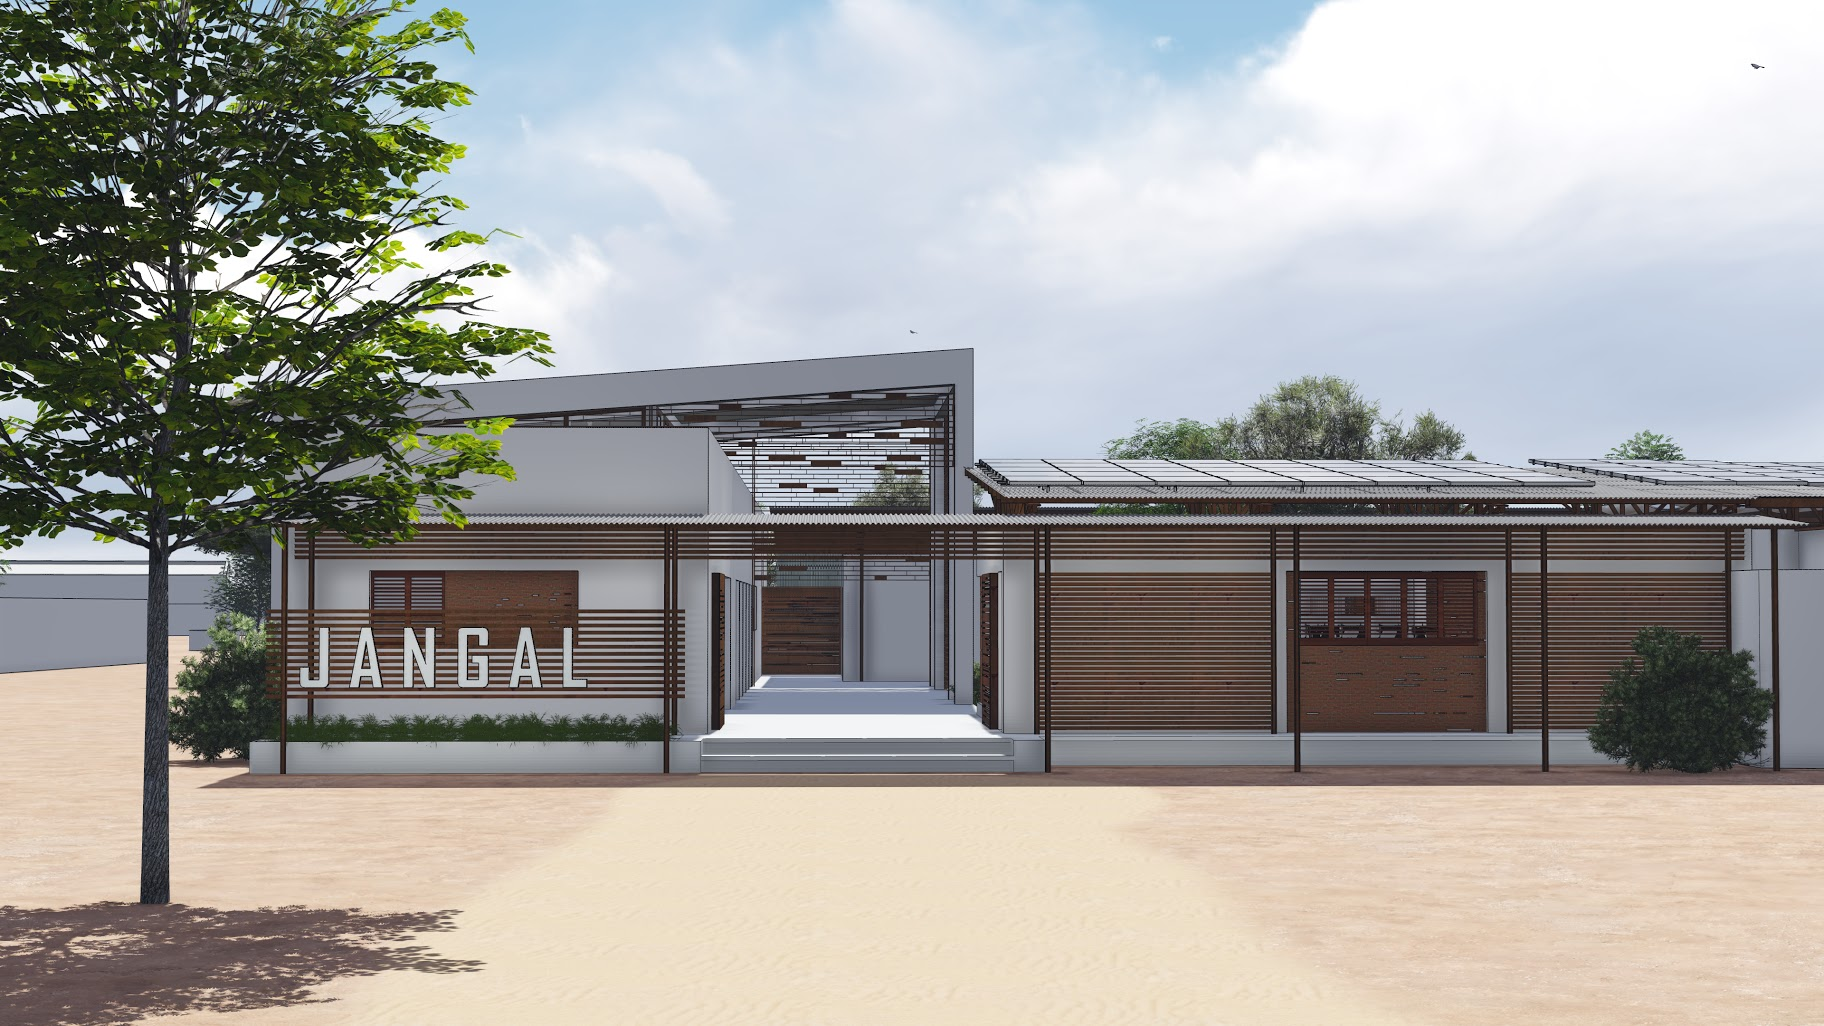 The Lambaye Learning Center, designed by BKSK Architects and the People of Lambaye. Phase I currently under construction.